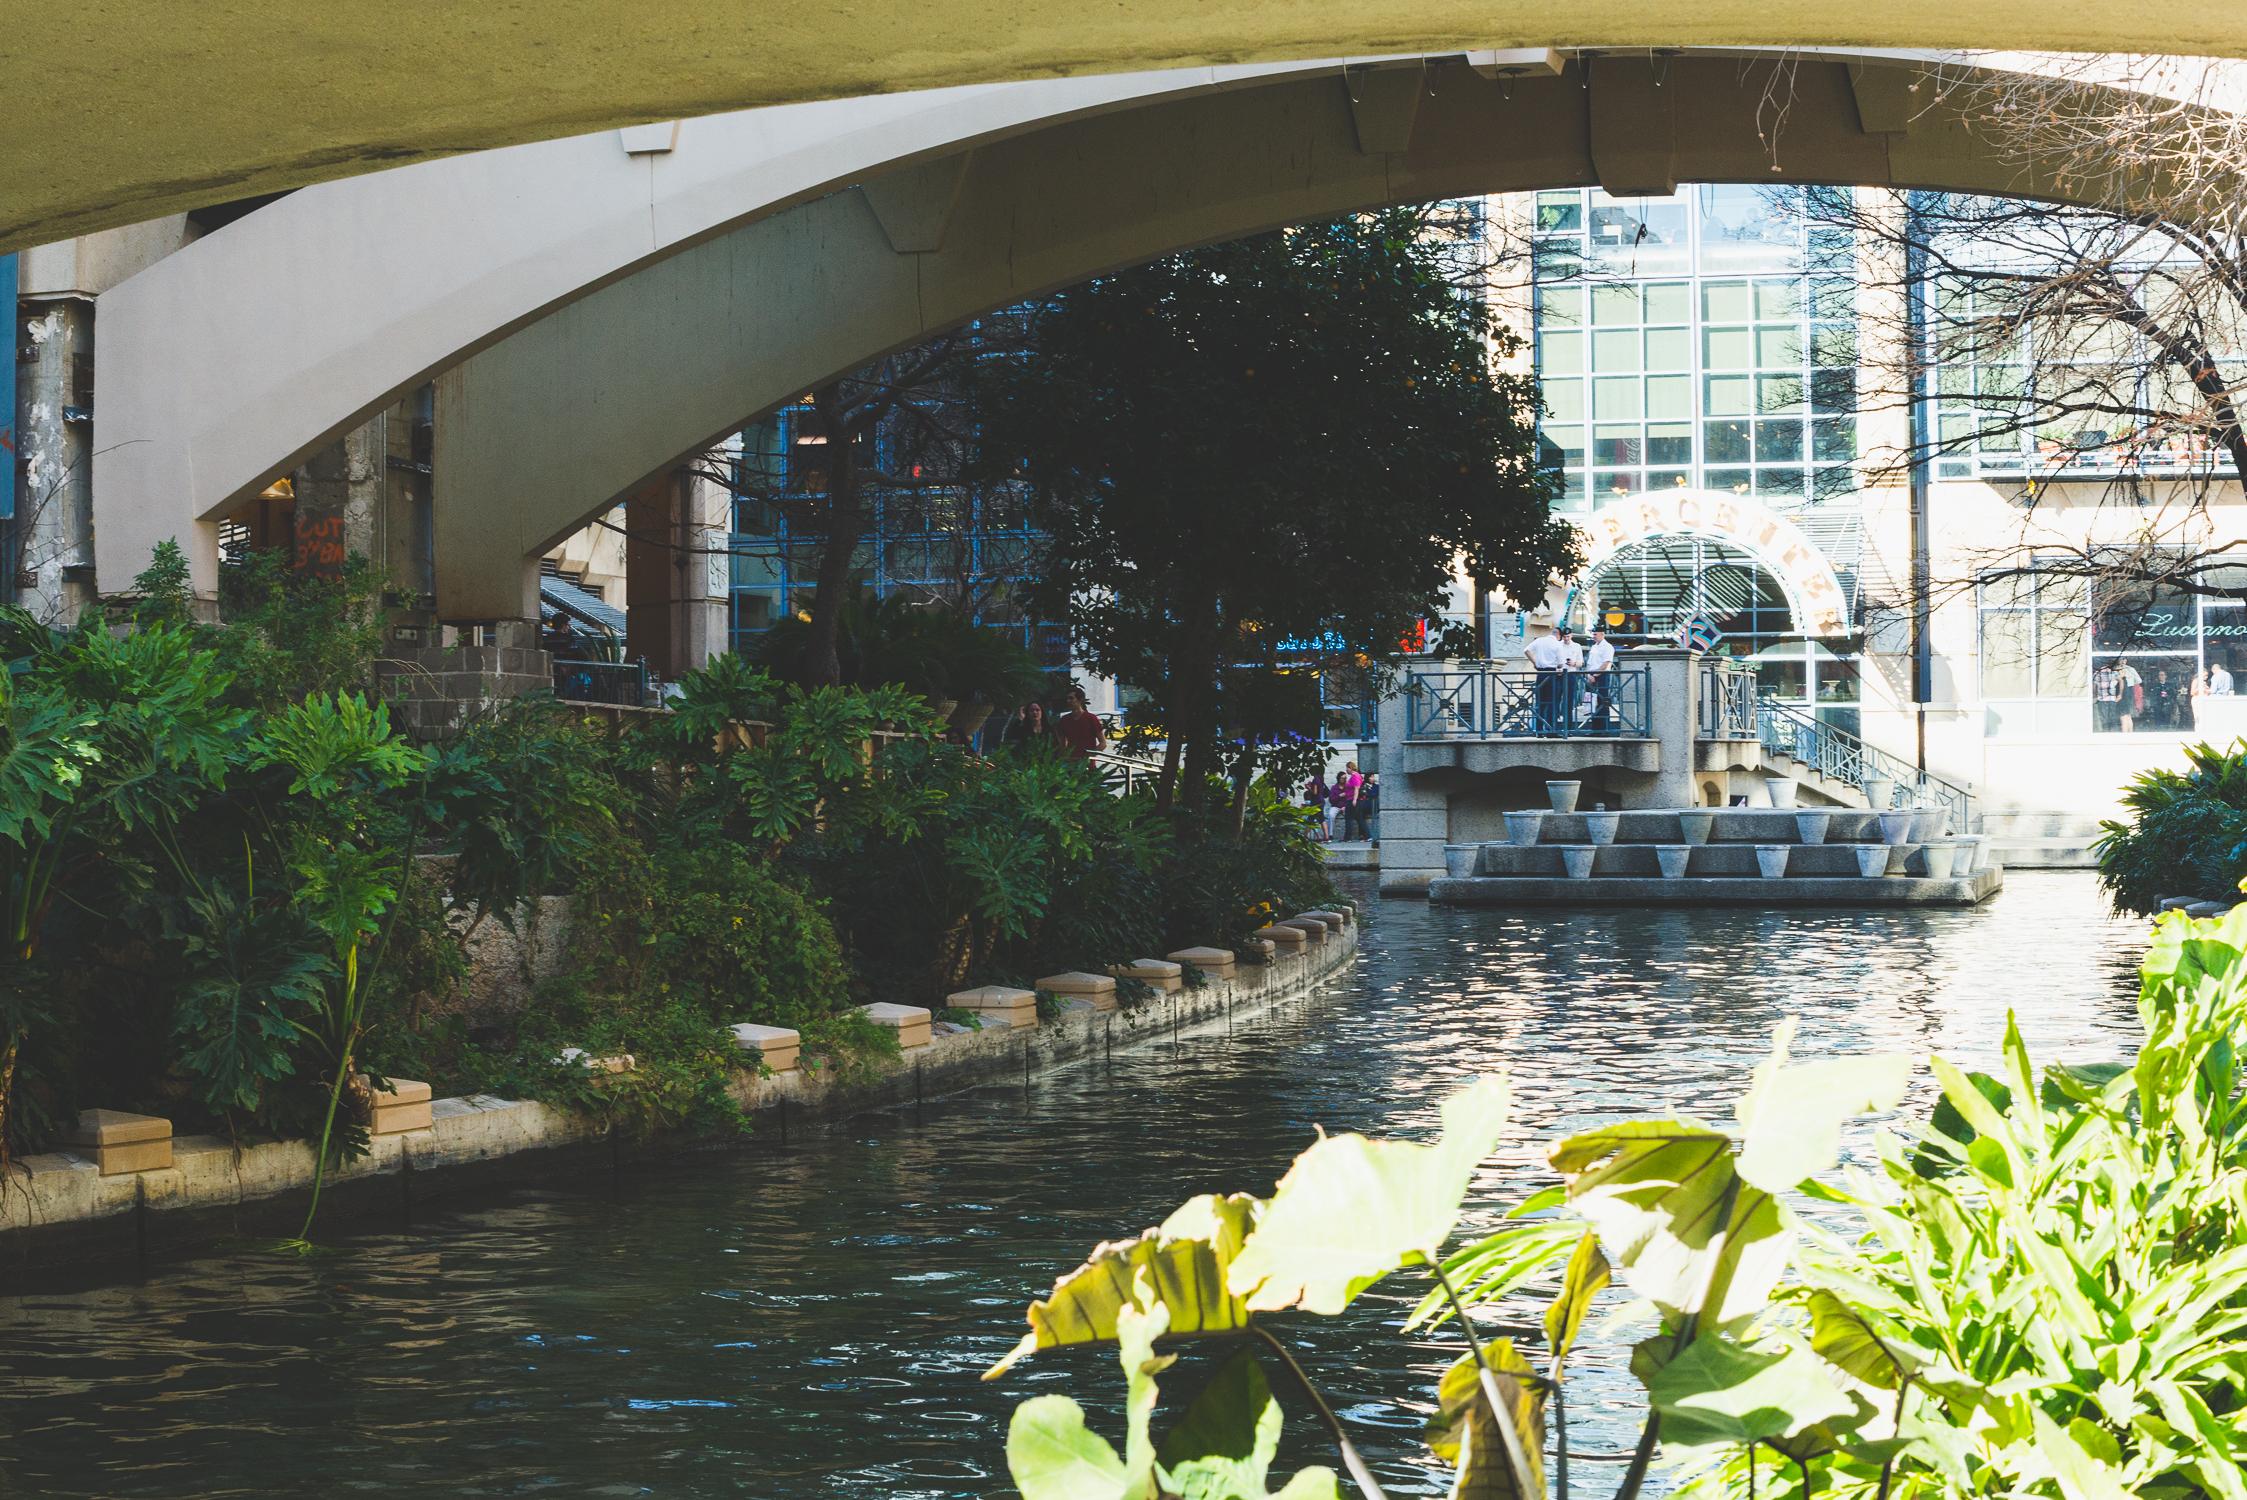 First glimpse of the River Walk. / 2/13/16 / San Antonio, TX